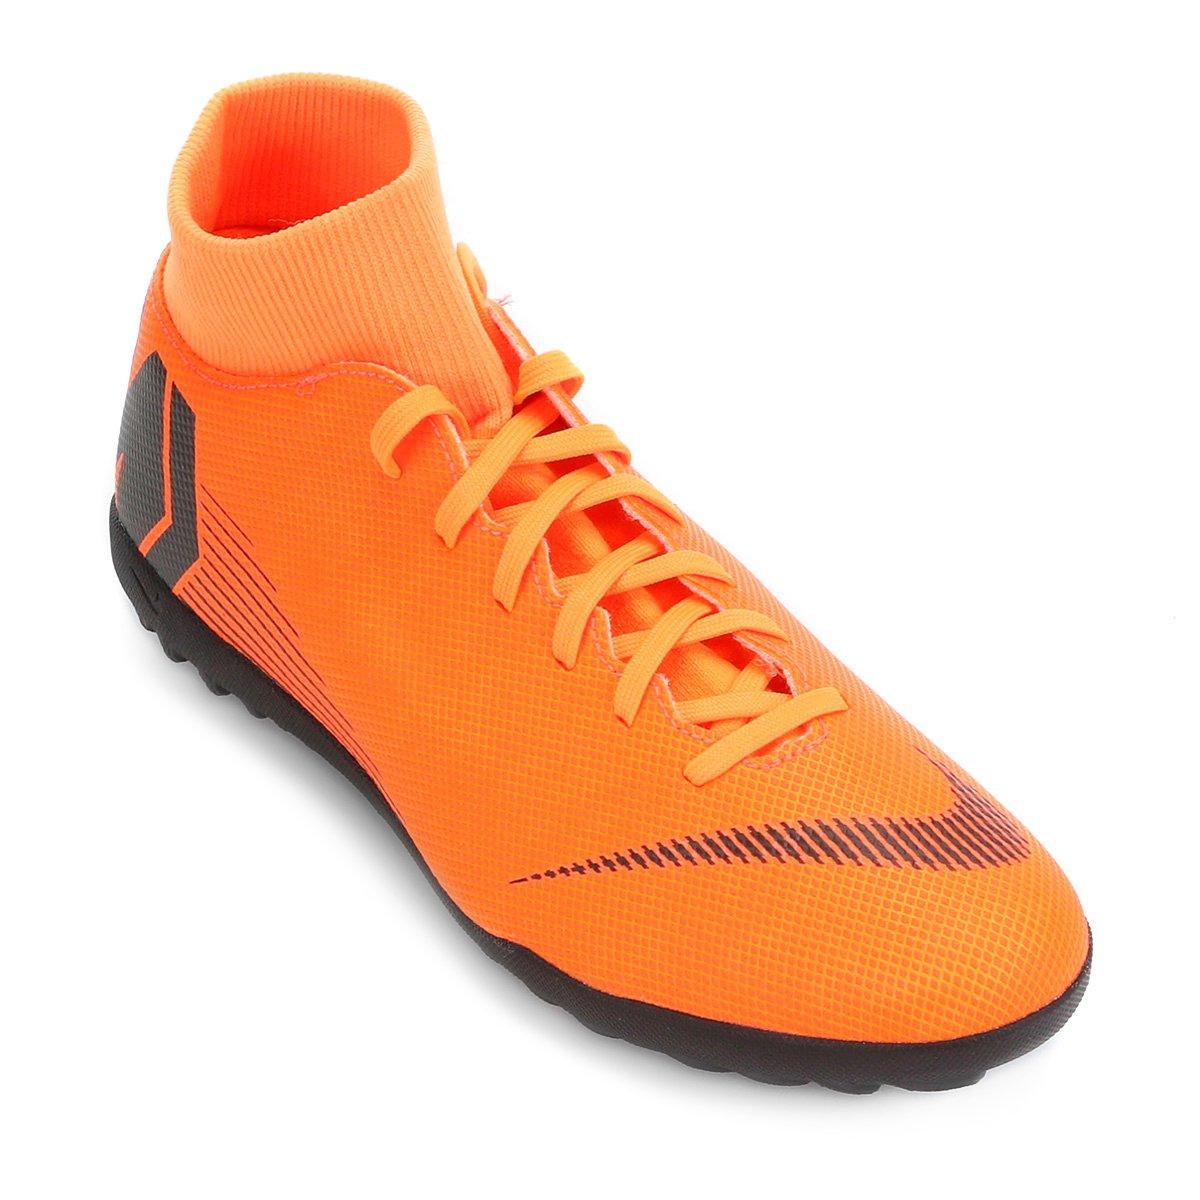 513c5b98bbc2b Chuteira Society Nike Mercurial Superfly 6 Club - Laranja e Preto ...